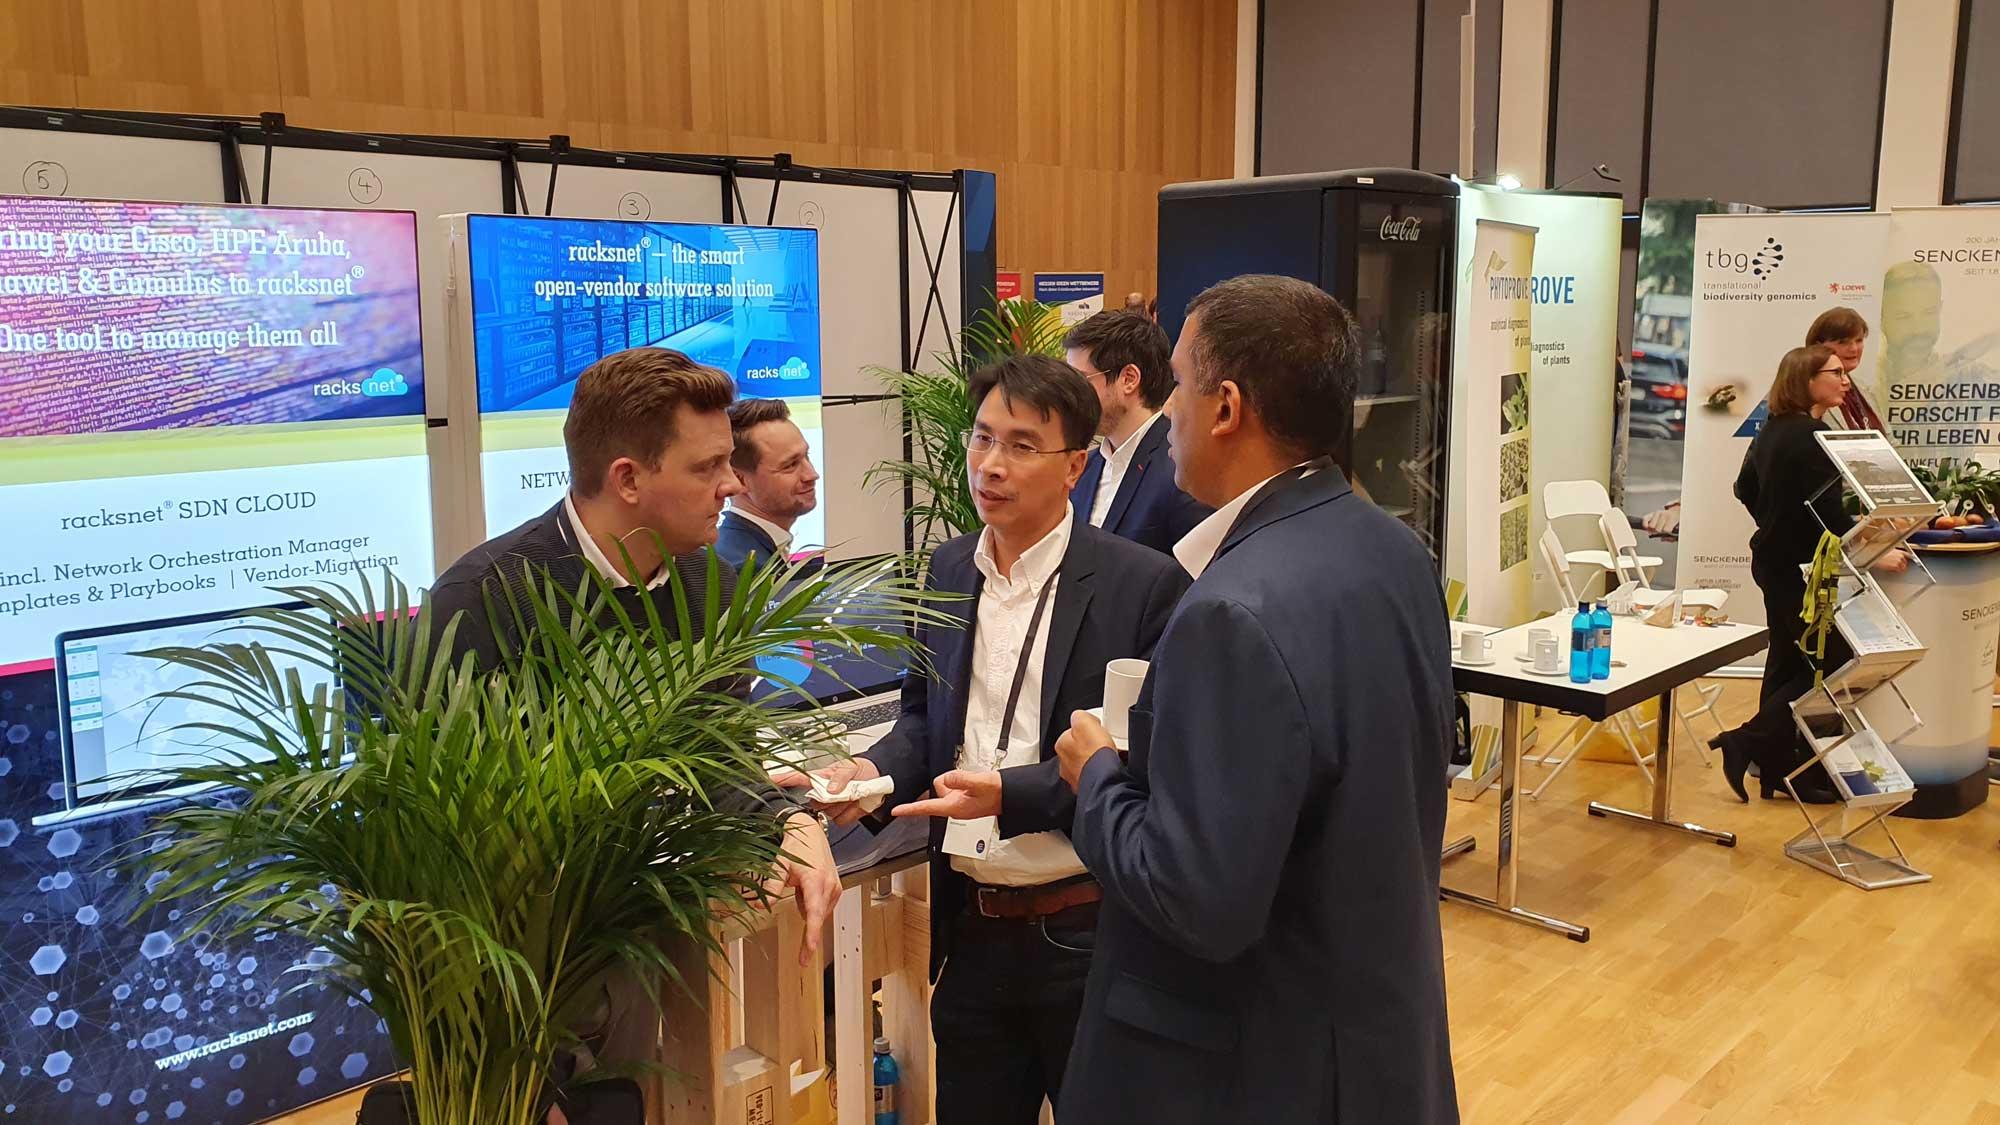 Exhibition – Innovation Congress, Wiesbaden